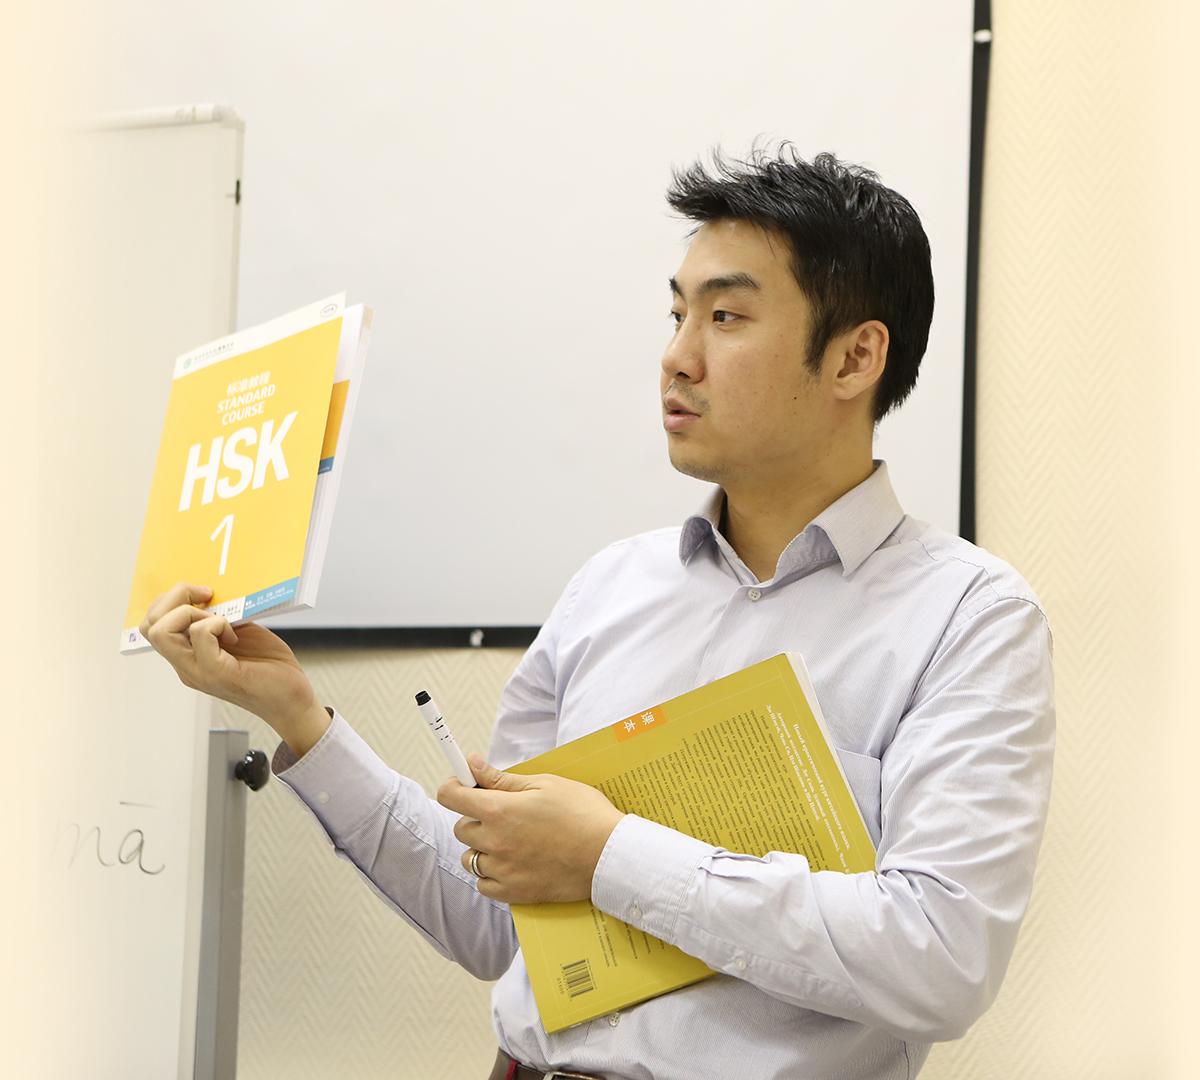 Учите Китайский Онлайн с Никитой Ван